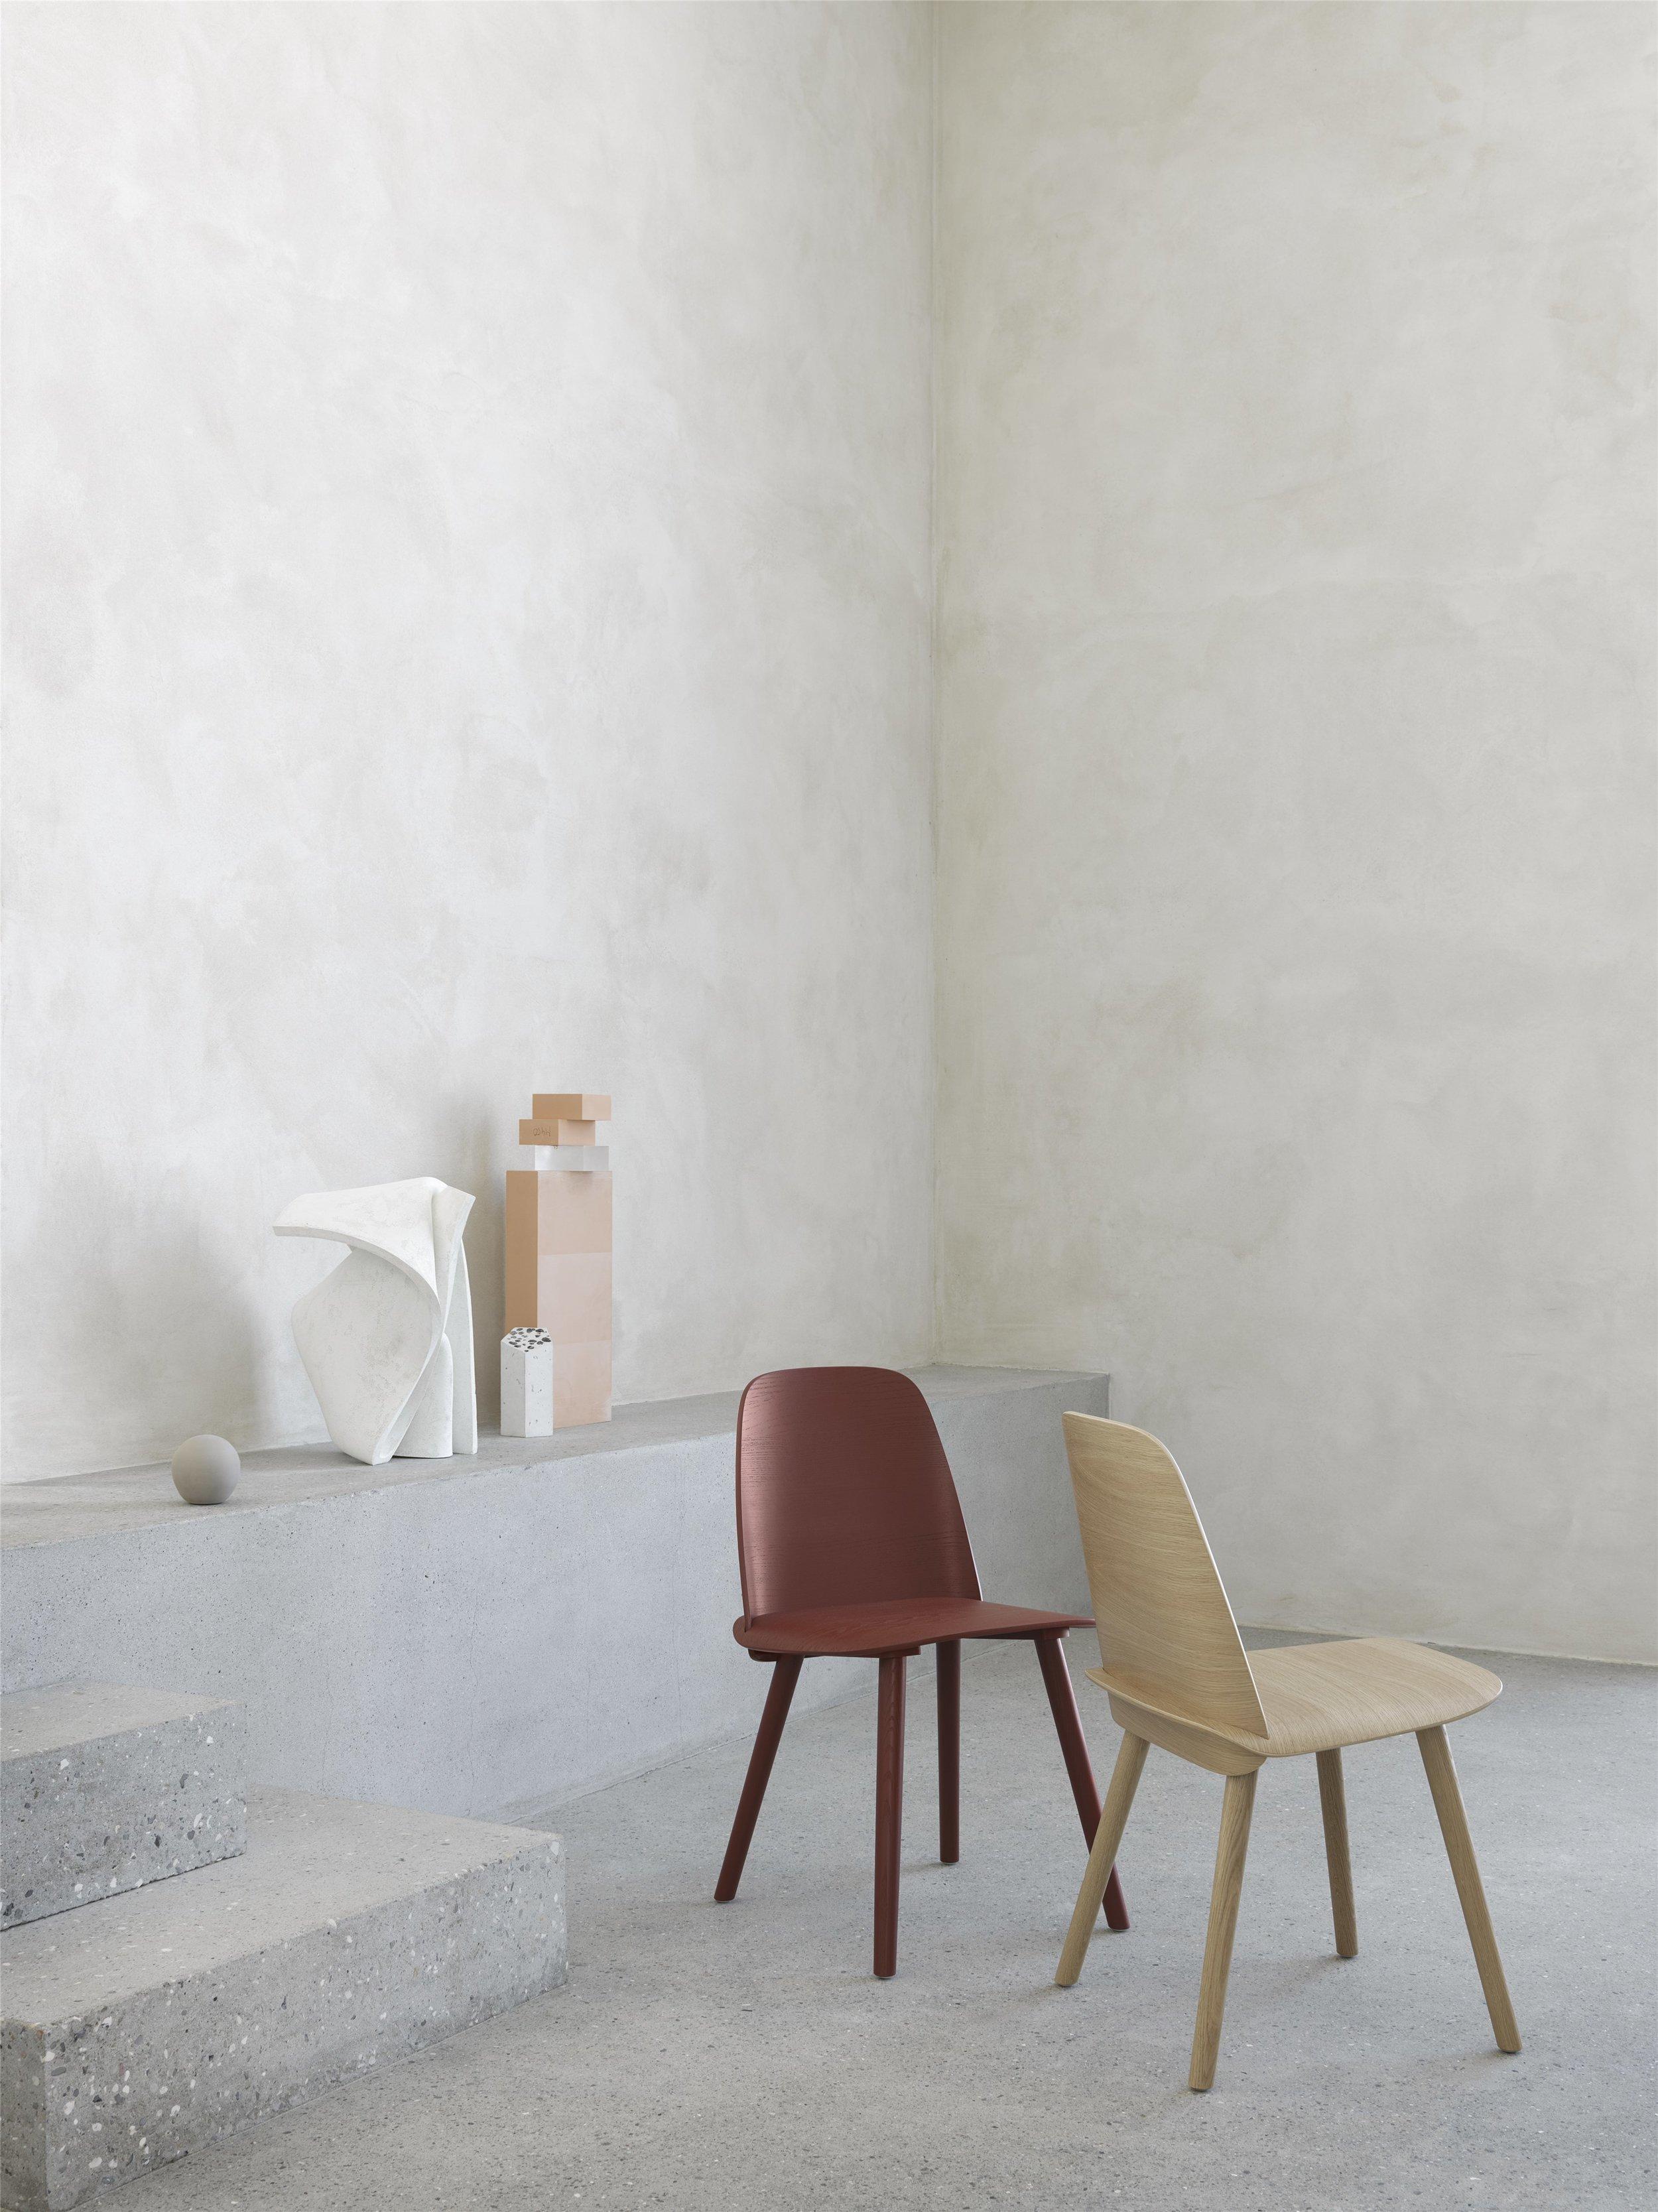 Nerd-Chair-Dark-Red-Oak-Org_(150).jpg